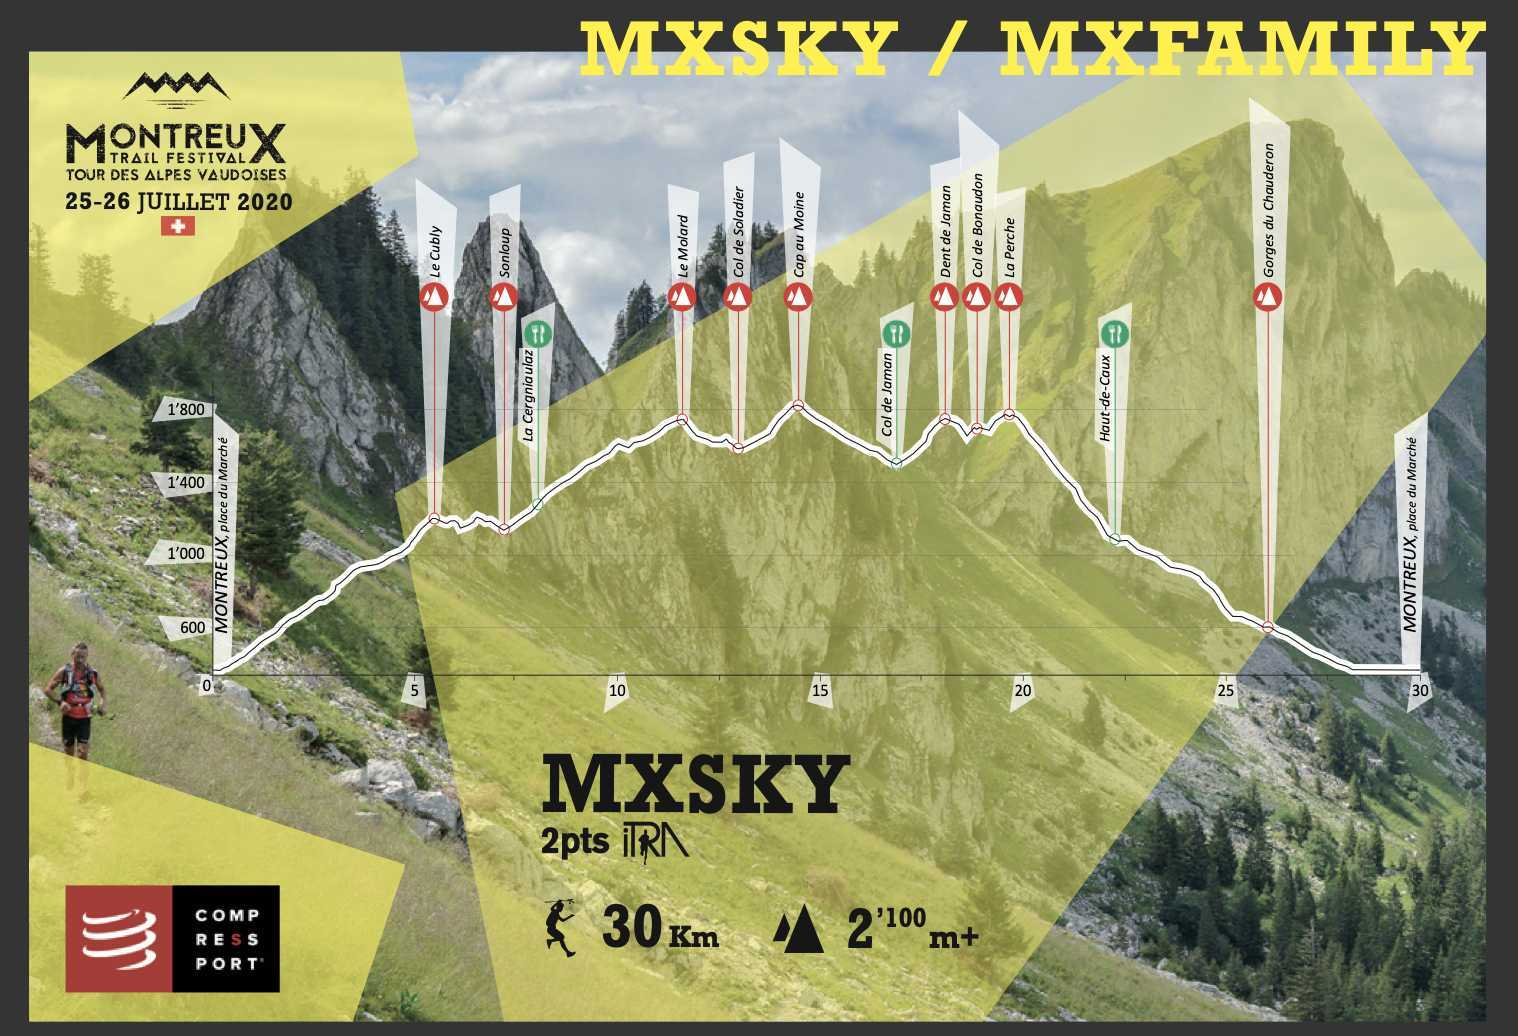 montreux mxsky